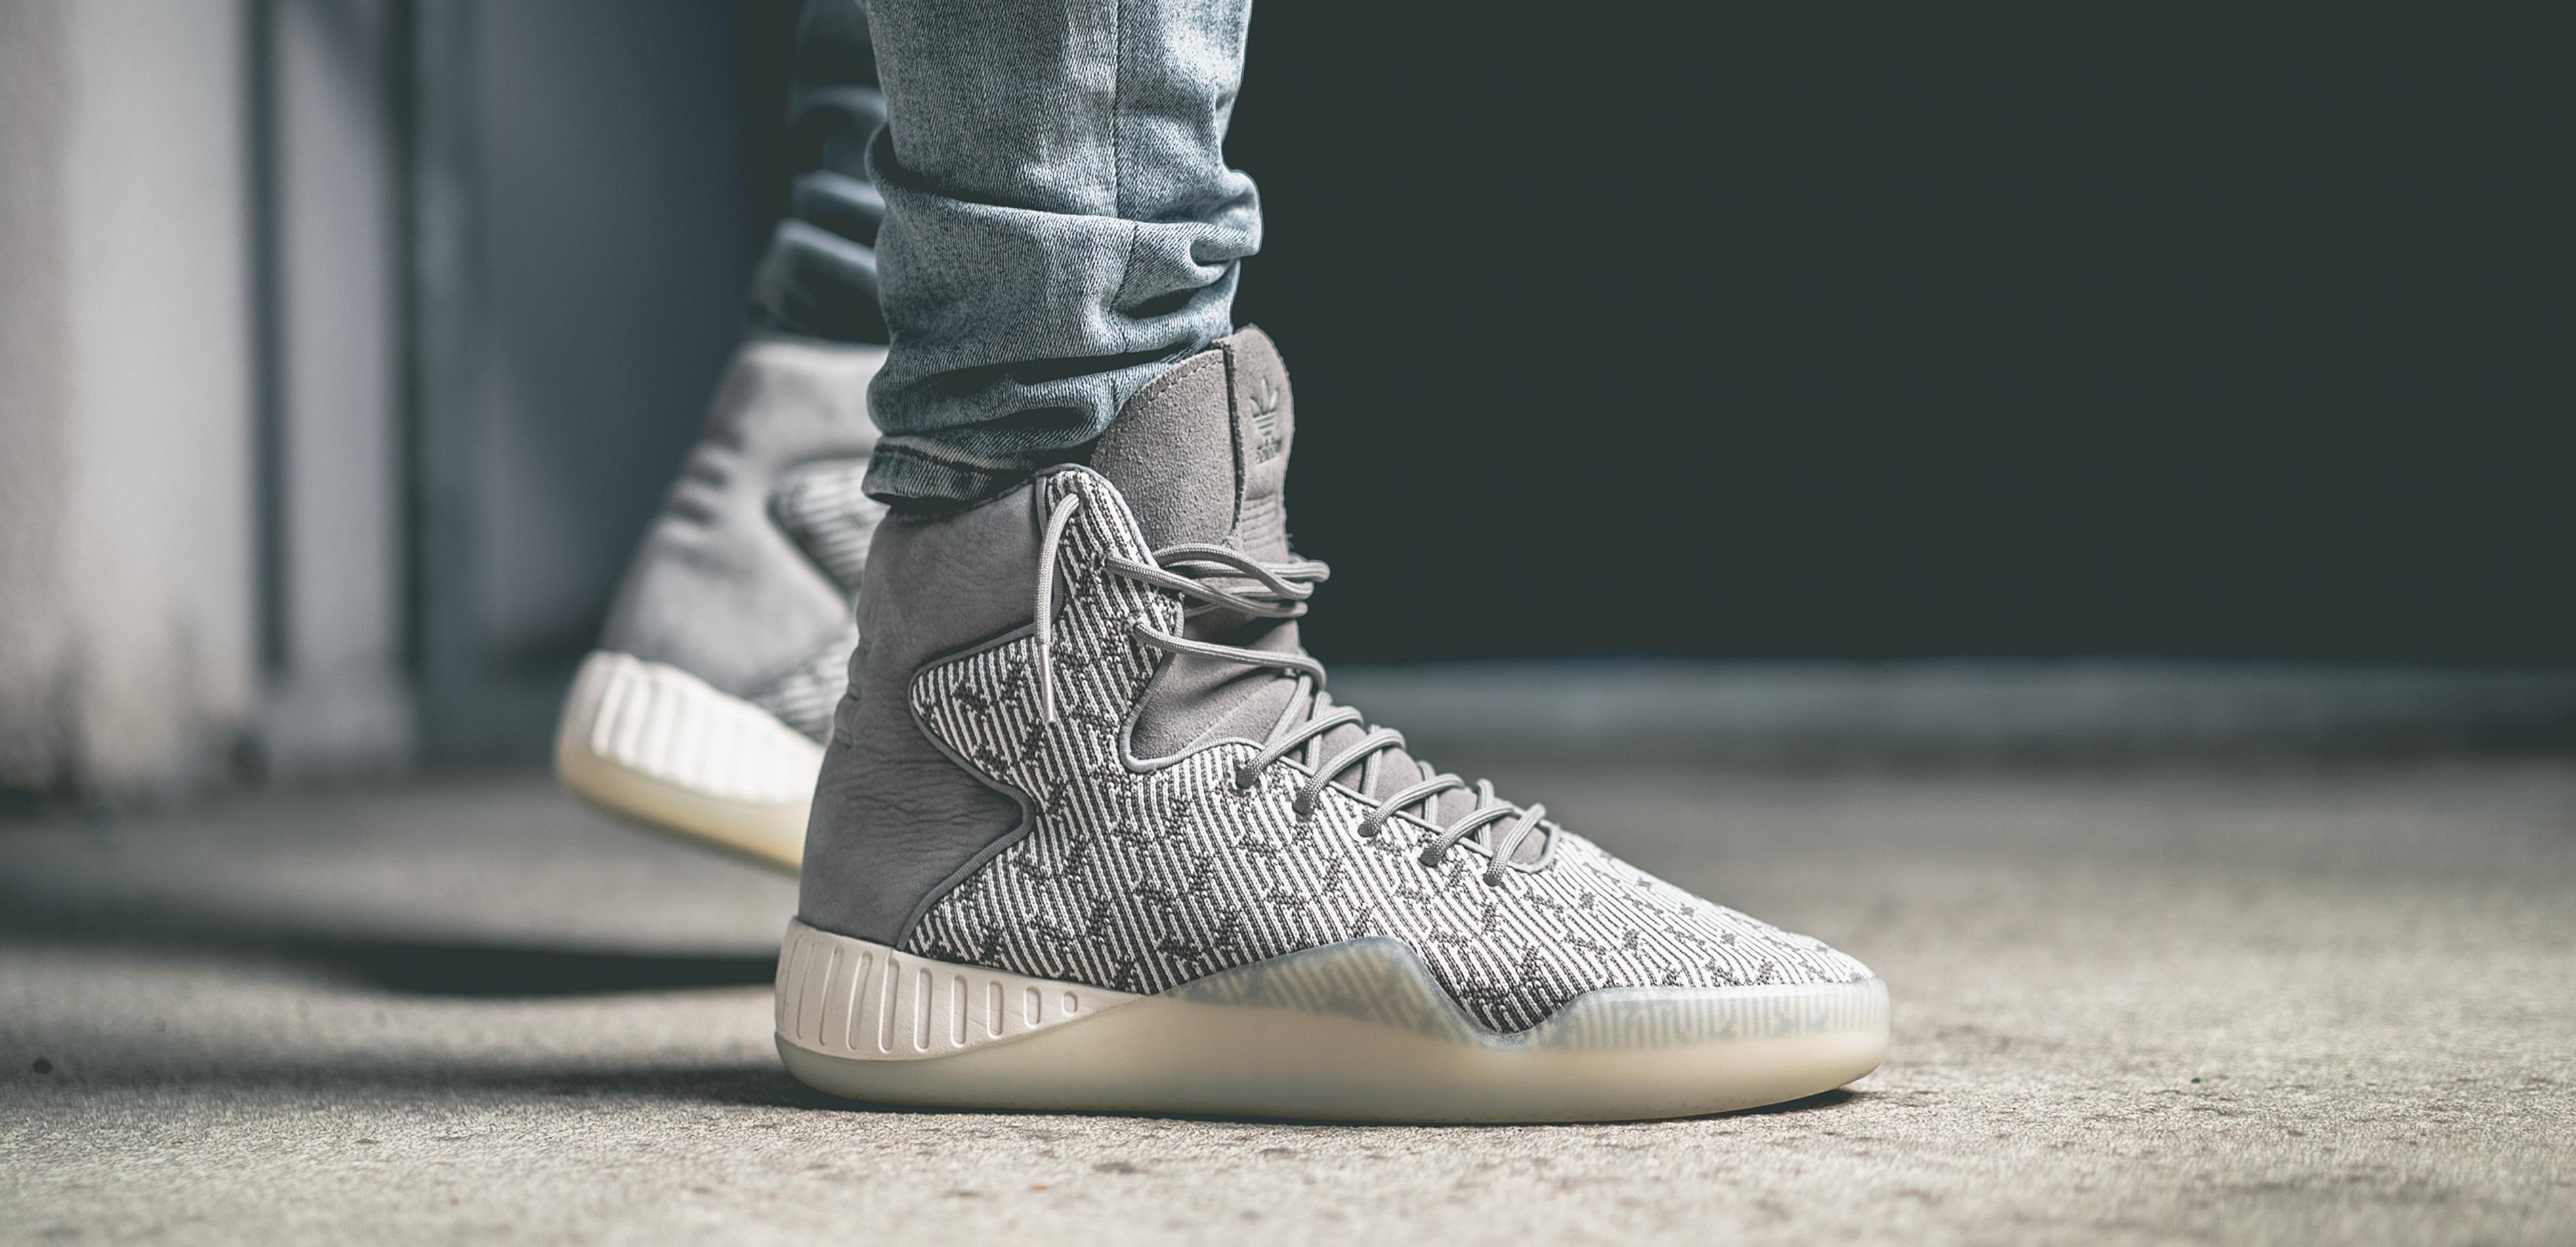 Adidas originals tubular instinct primeknit grey feather